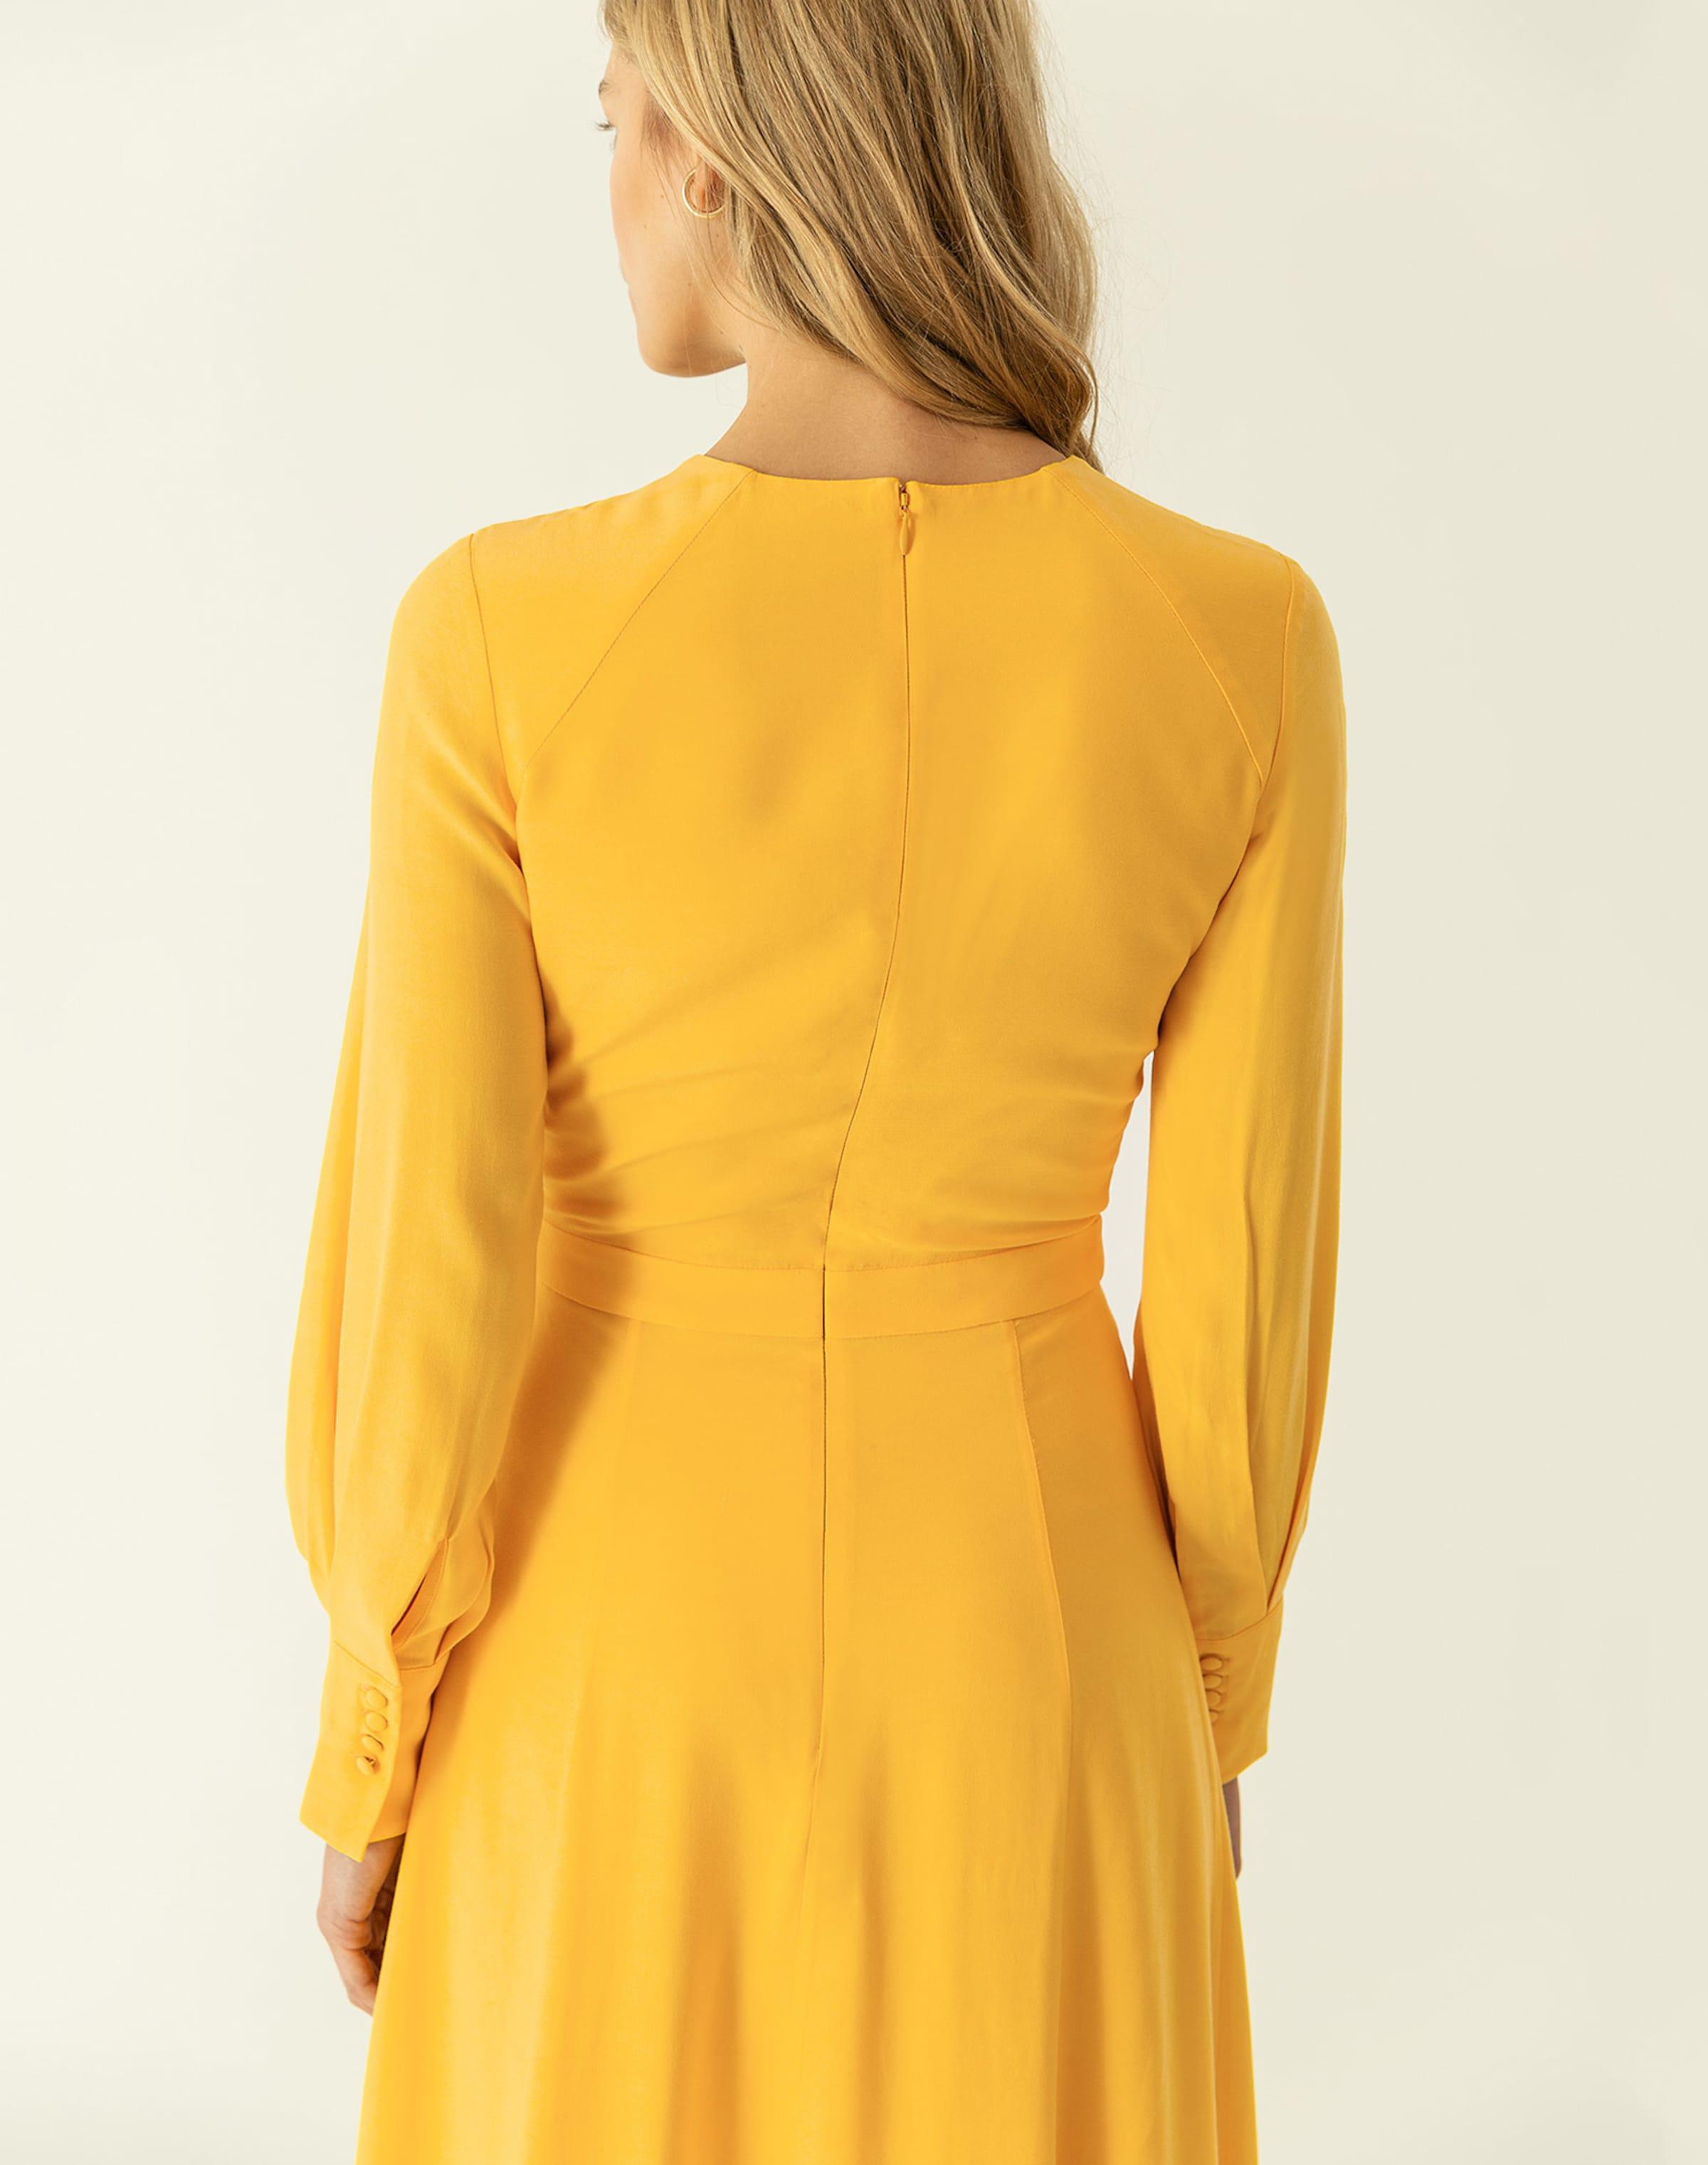 Oak Limone Ivyamp; In Dress Ivyamp; shrQCdt